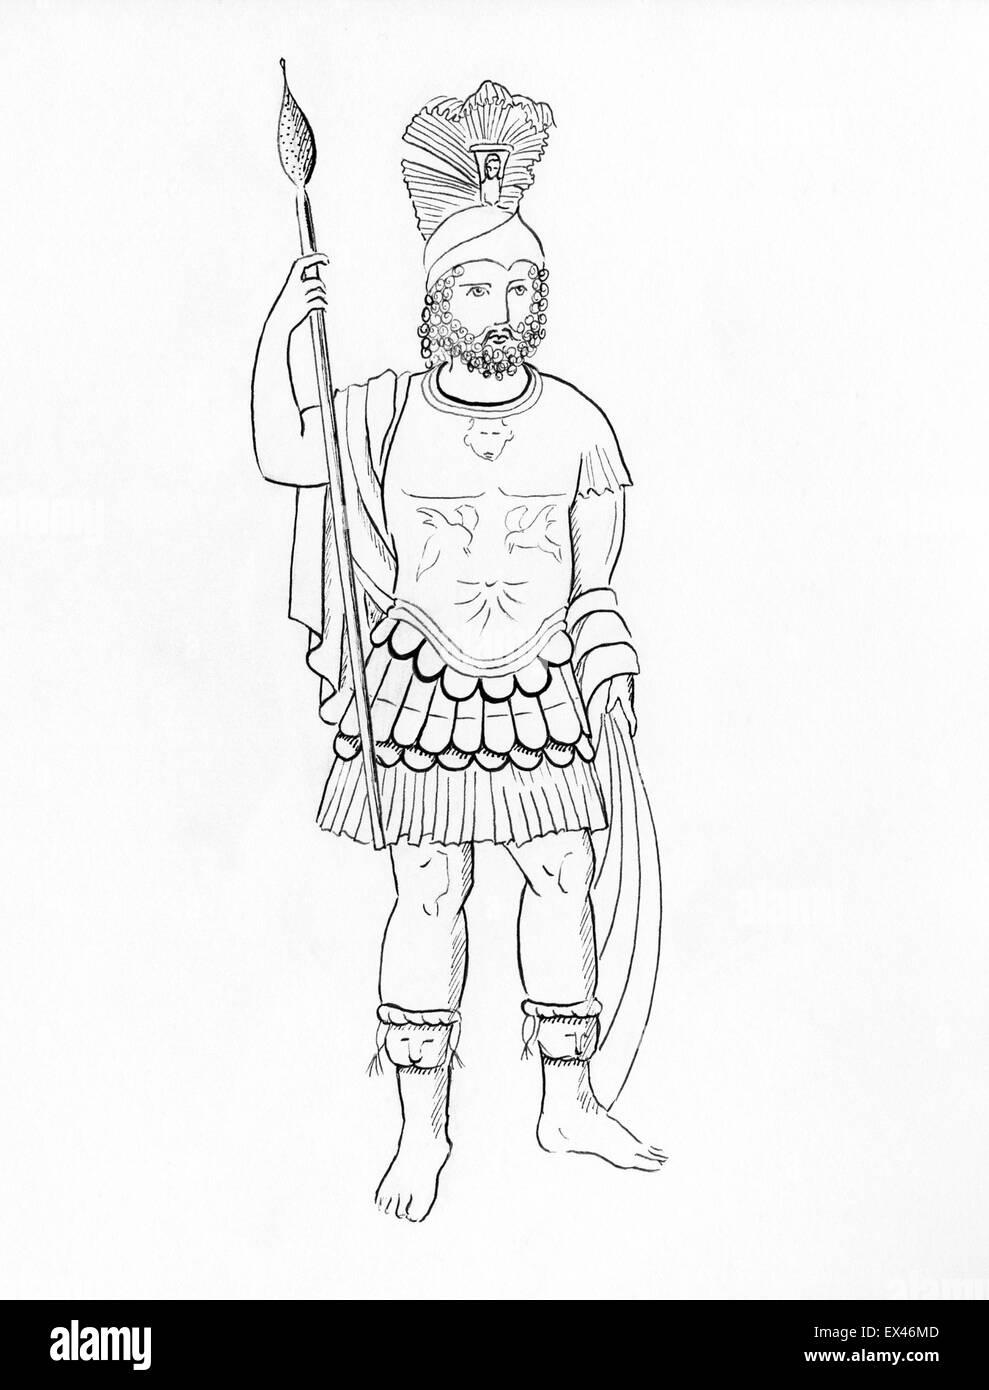 Line drawing of Mars god of war - Stock Image